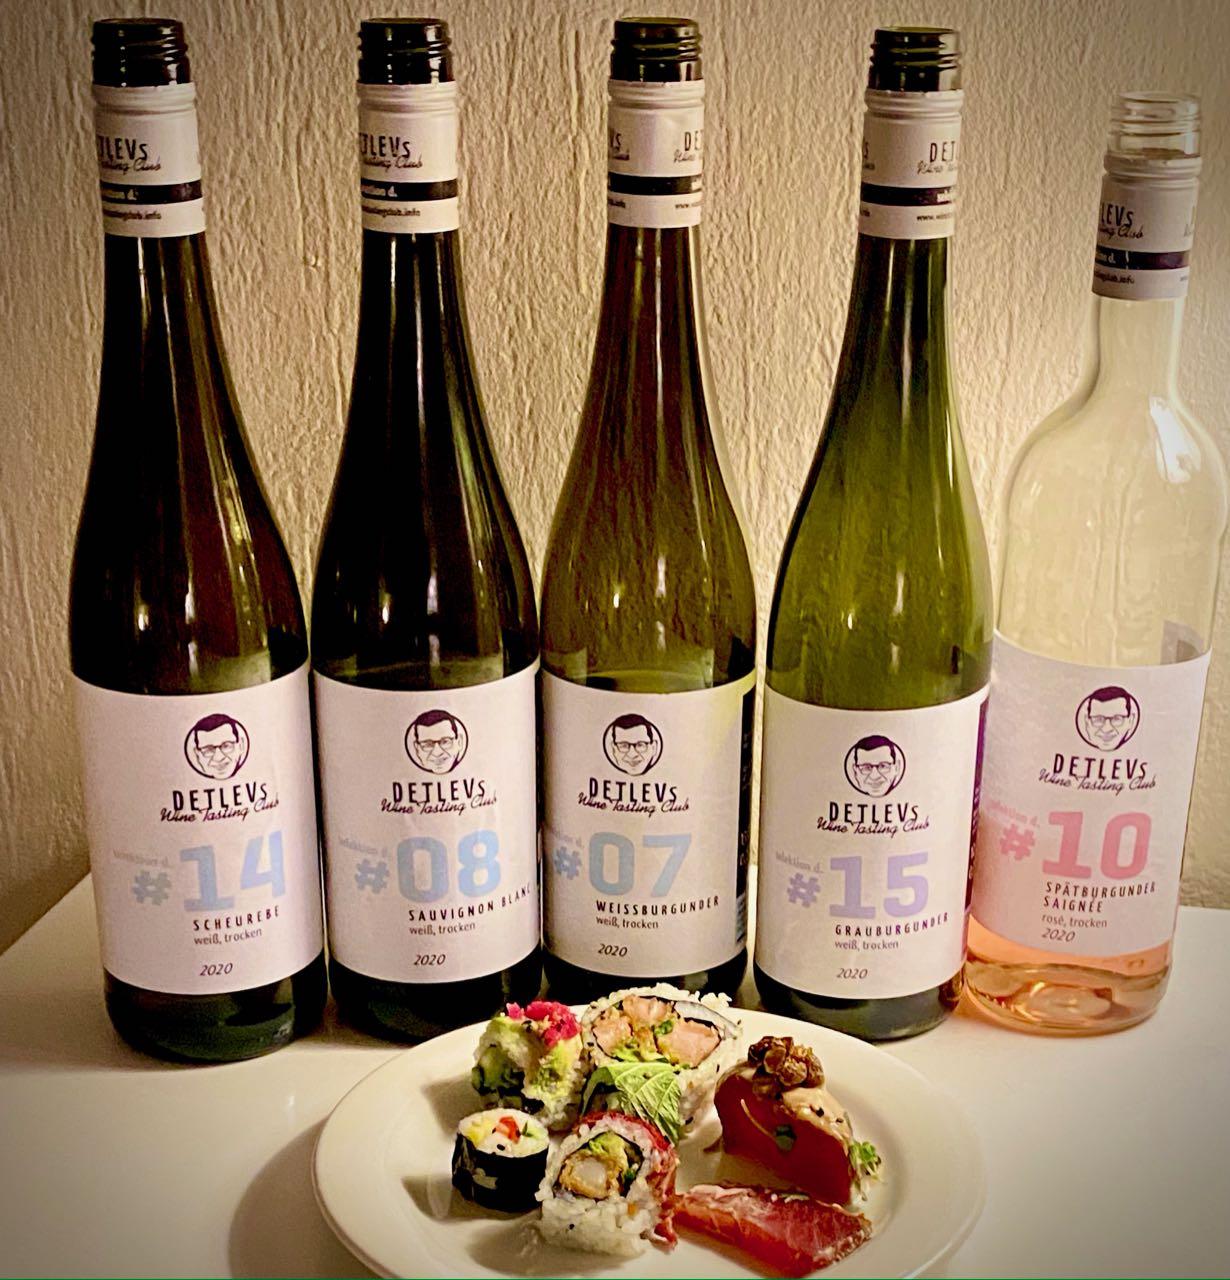 "DETLEVs ""selektion d."" No. 08 Sauvignon Blanc, bio, Jg. 2020"